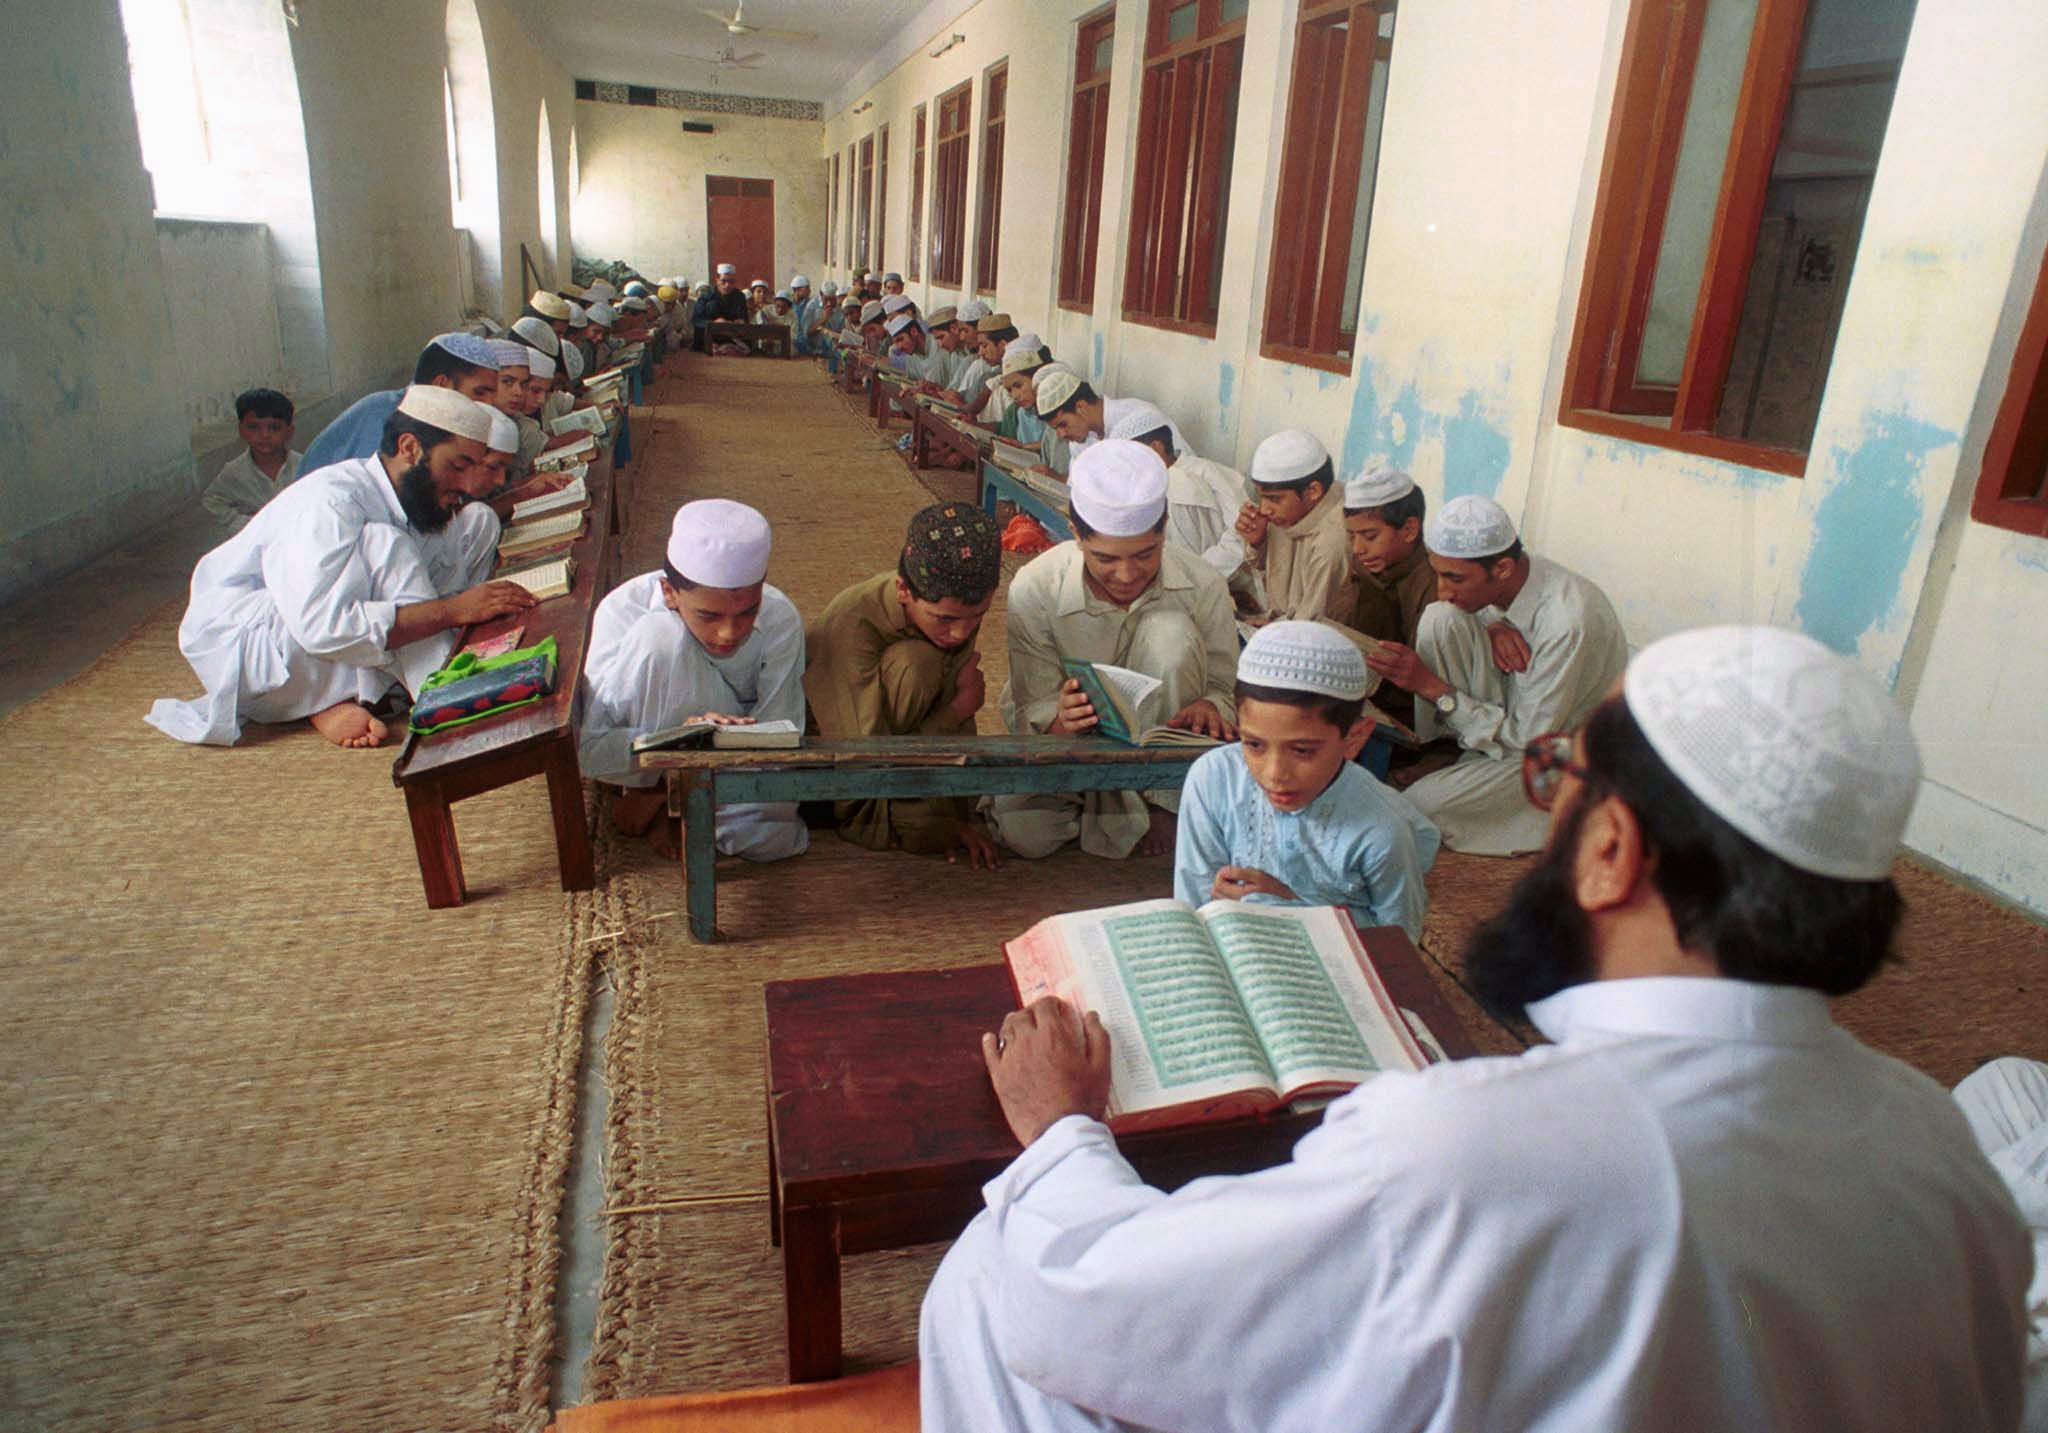 Картинки по запросу pakistani madrasa